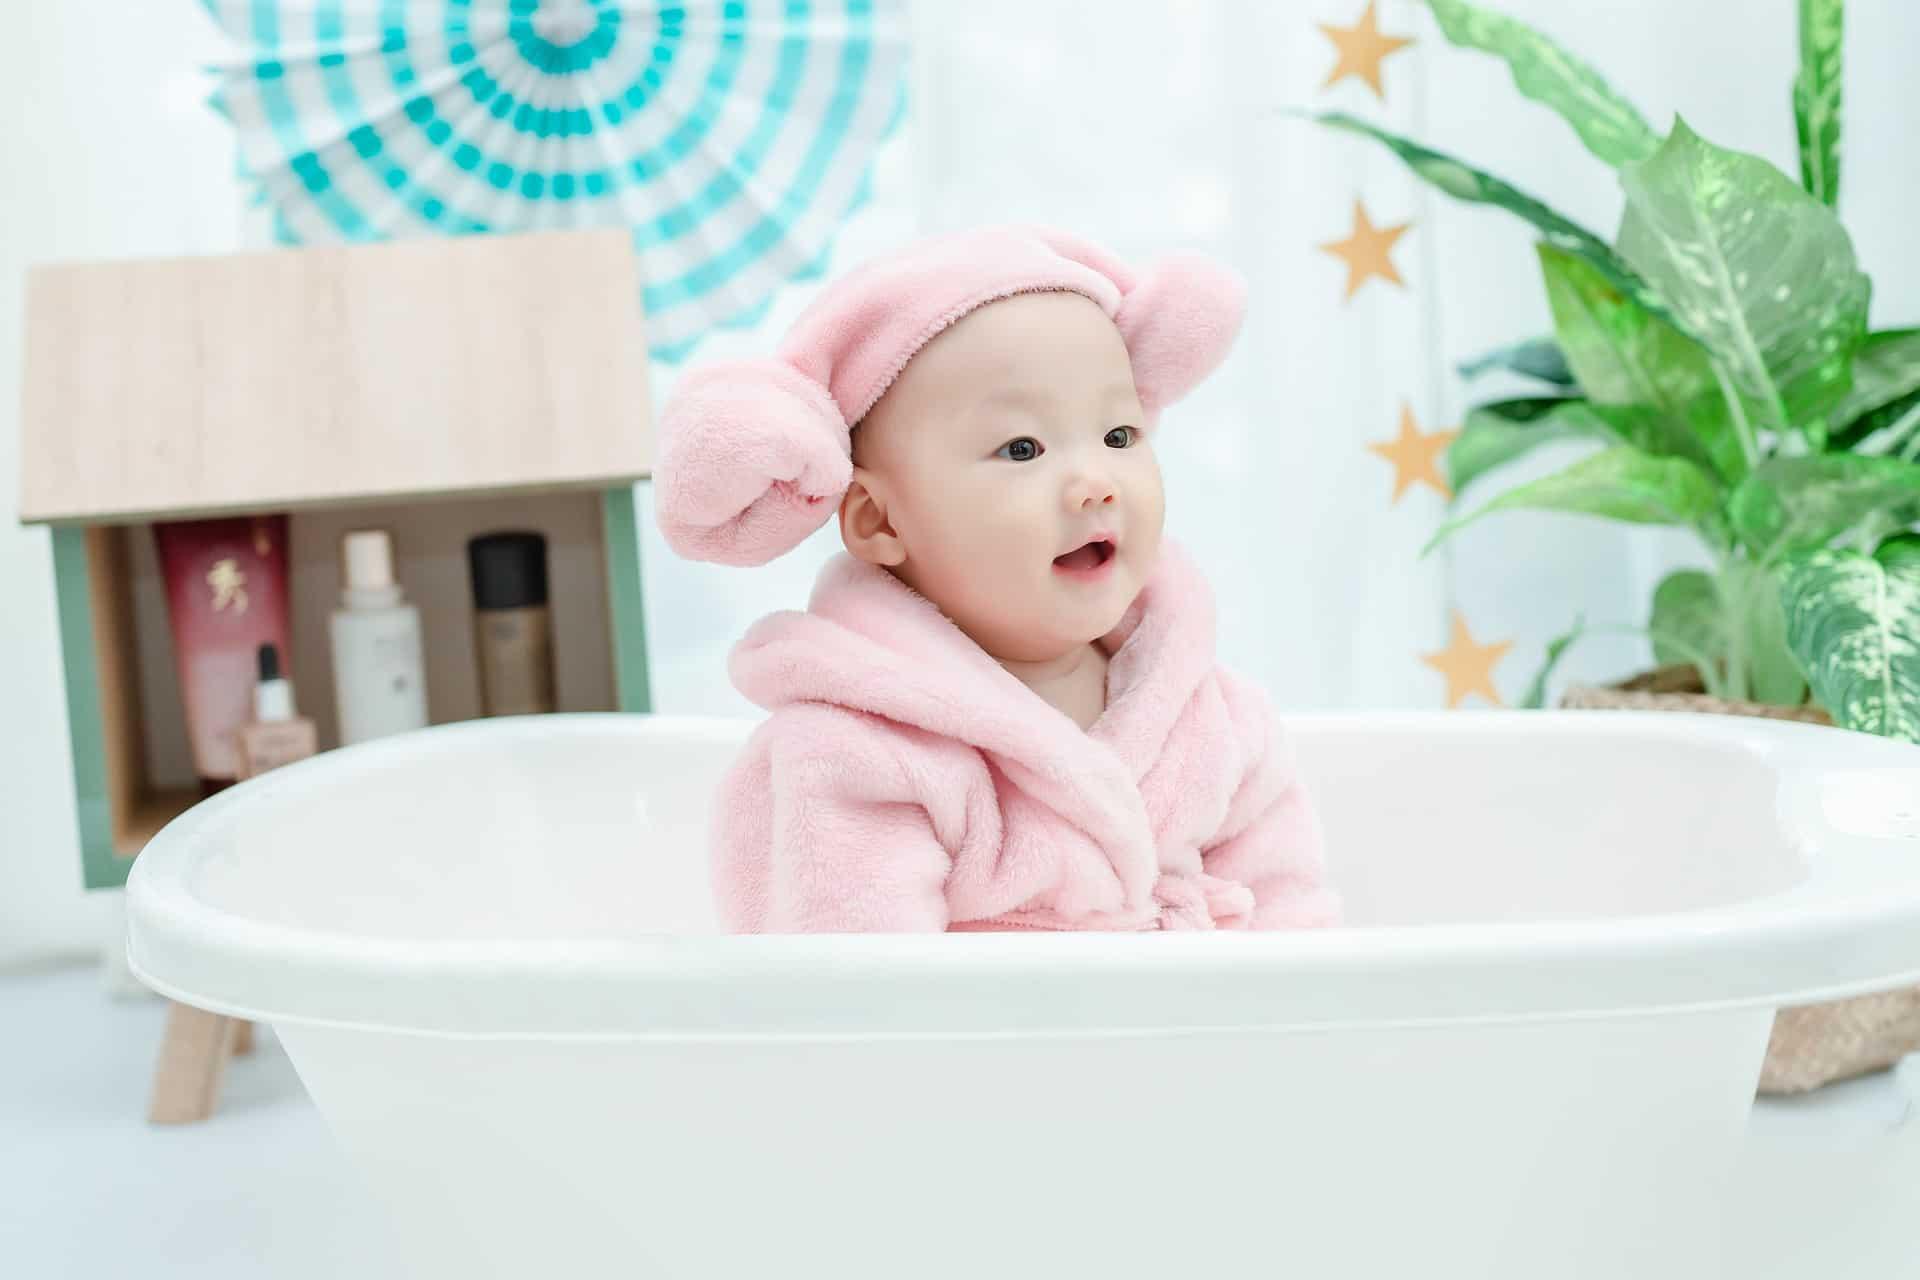 Bañera o tina grande